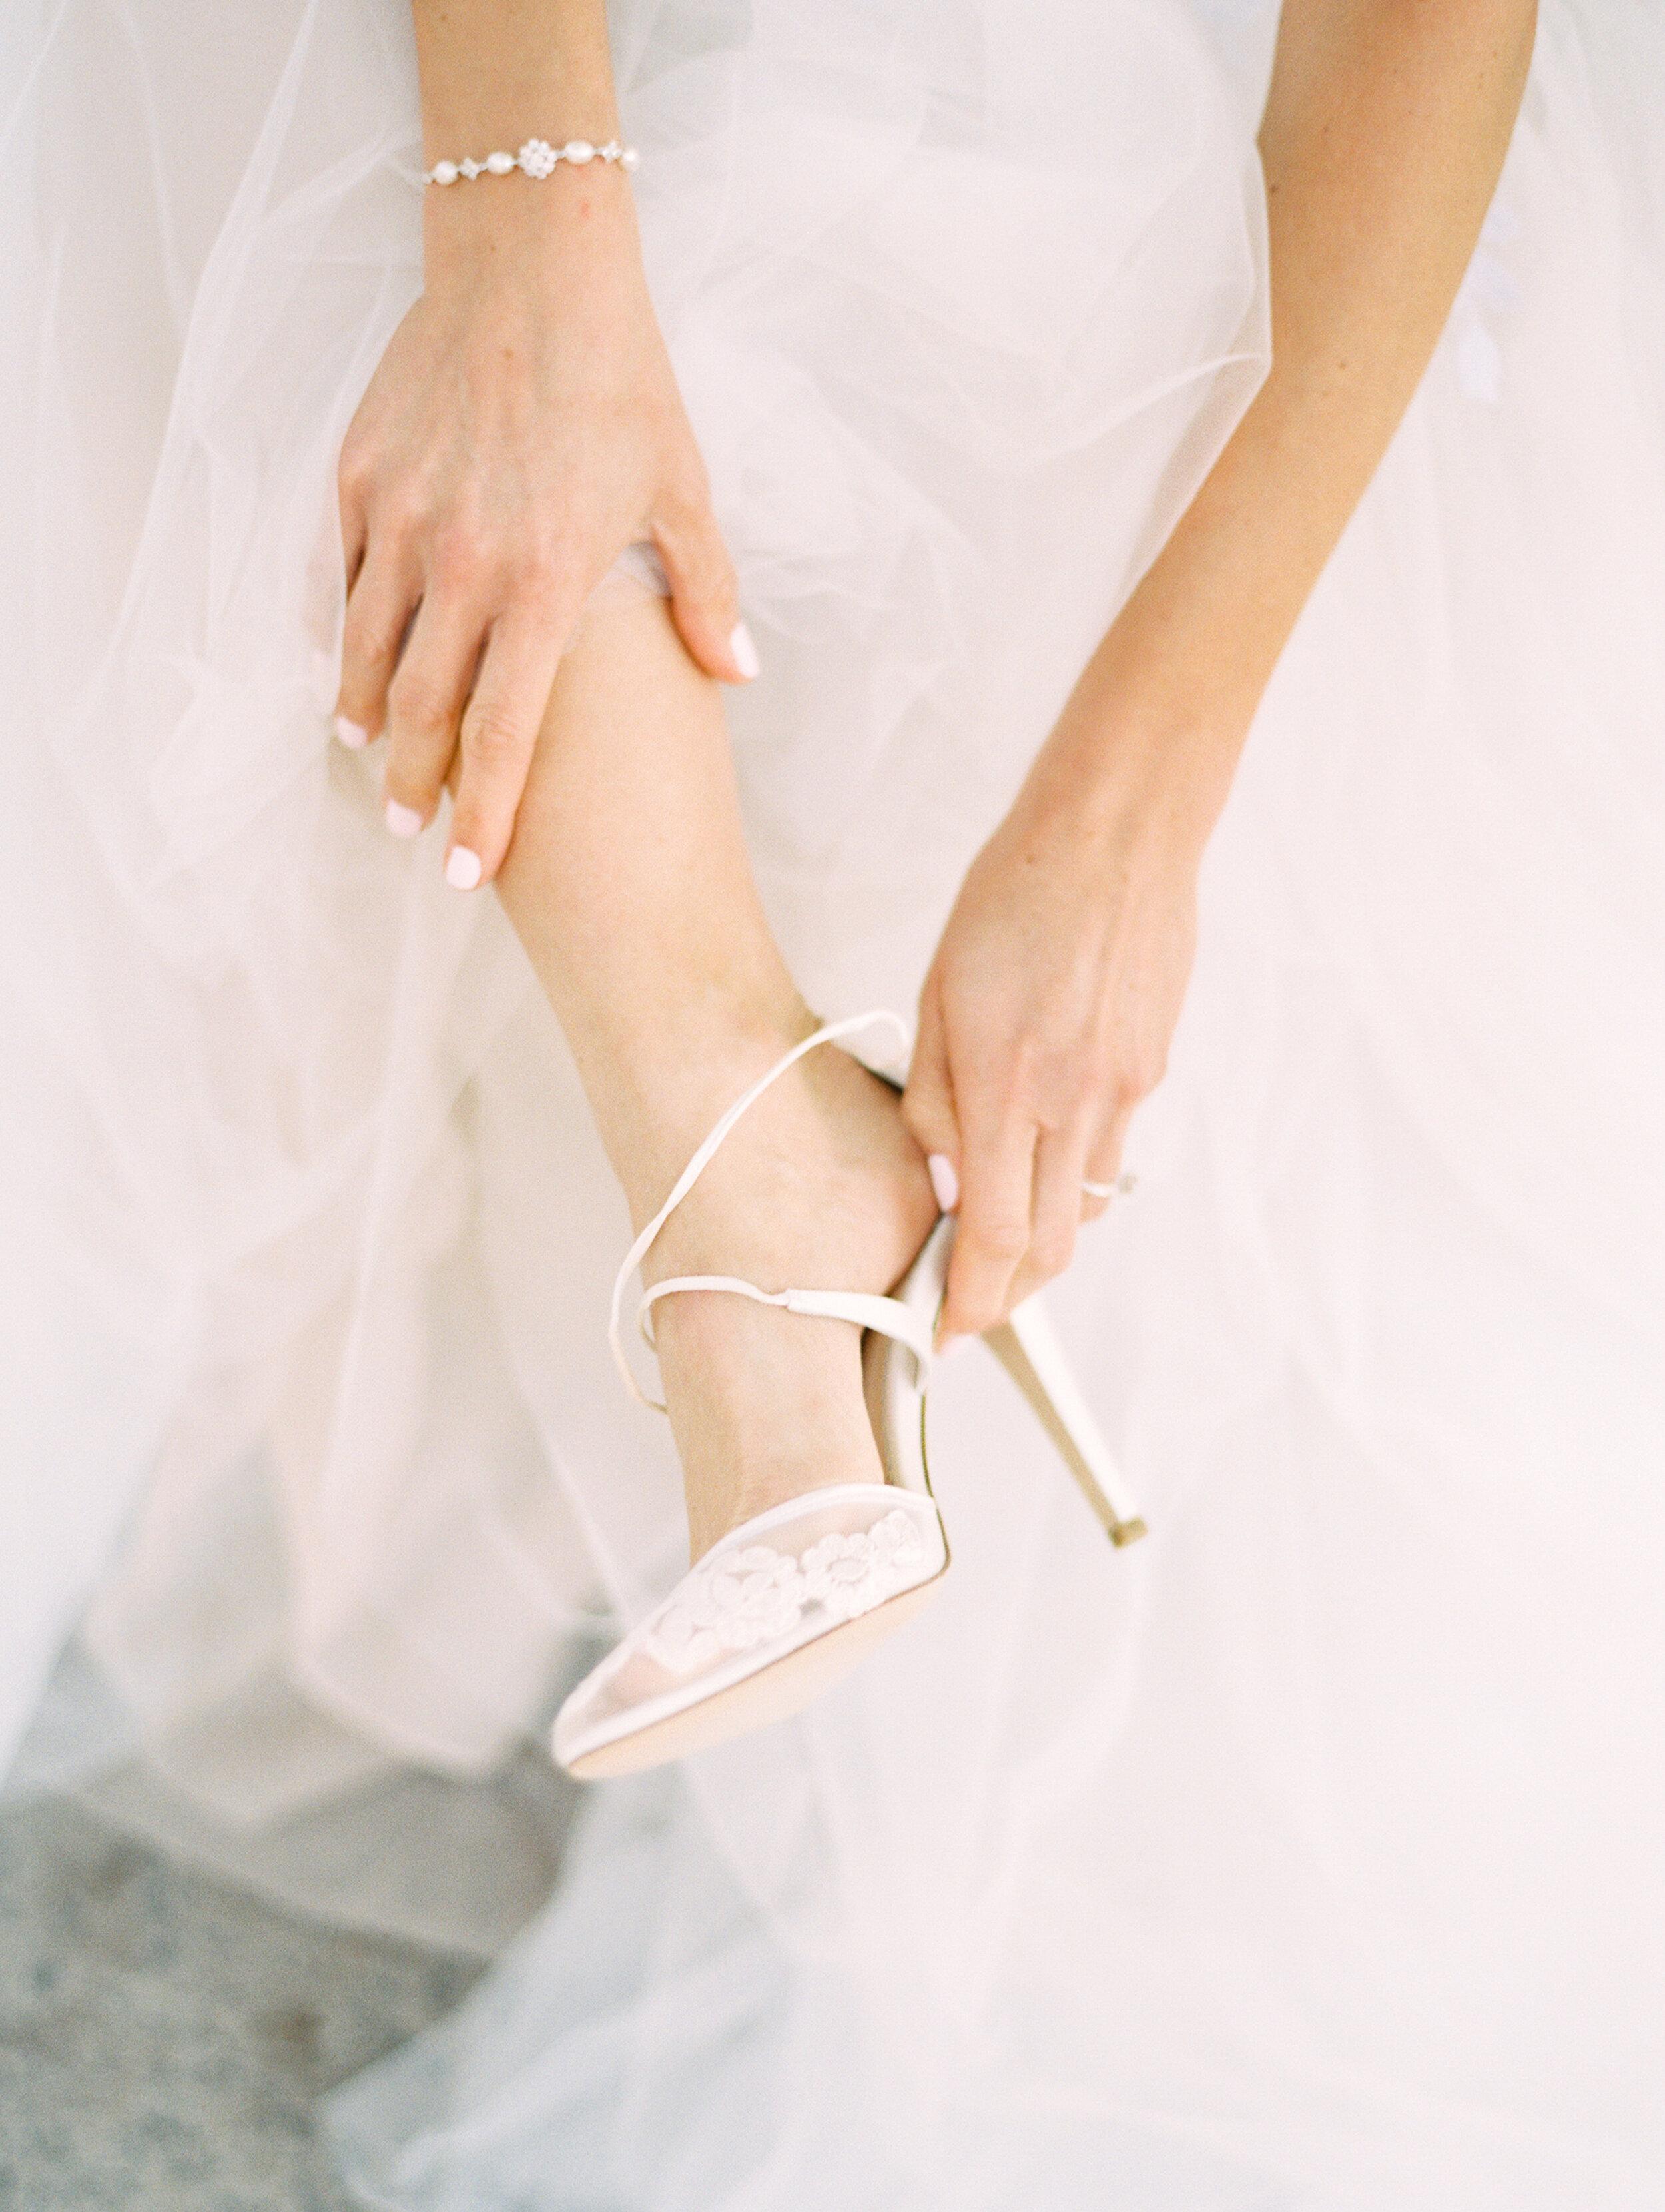 Steinlage+Wedding+Getting+Ready-75.jpg